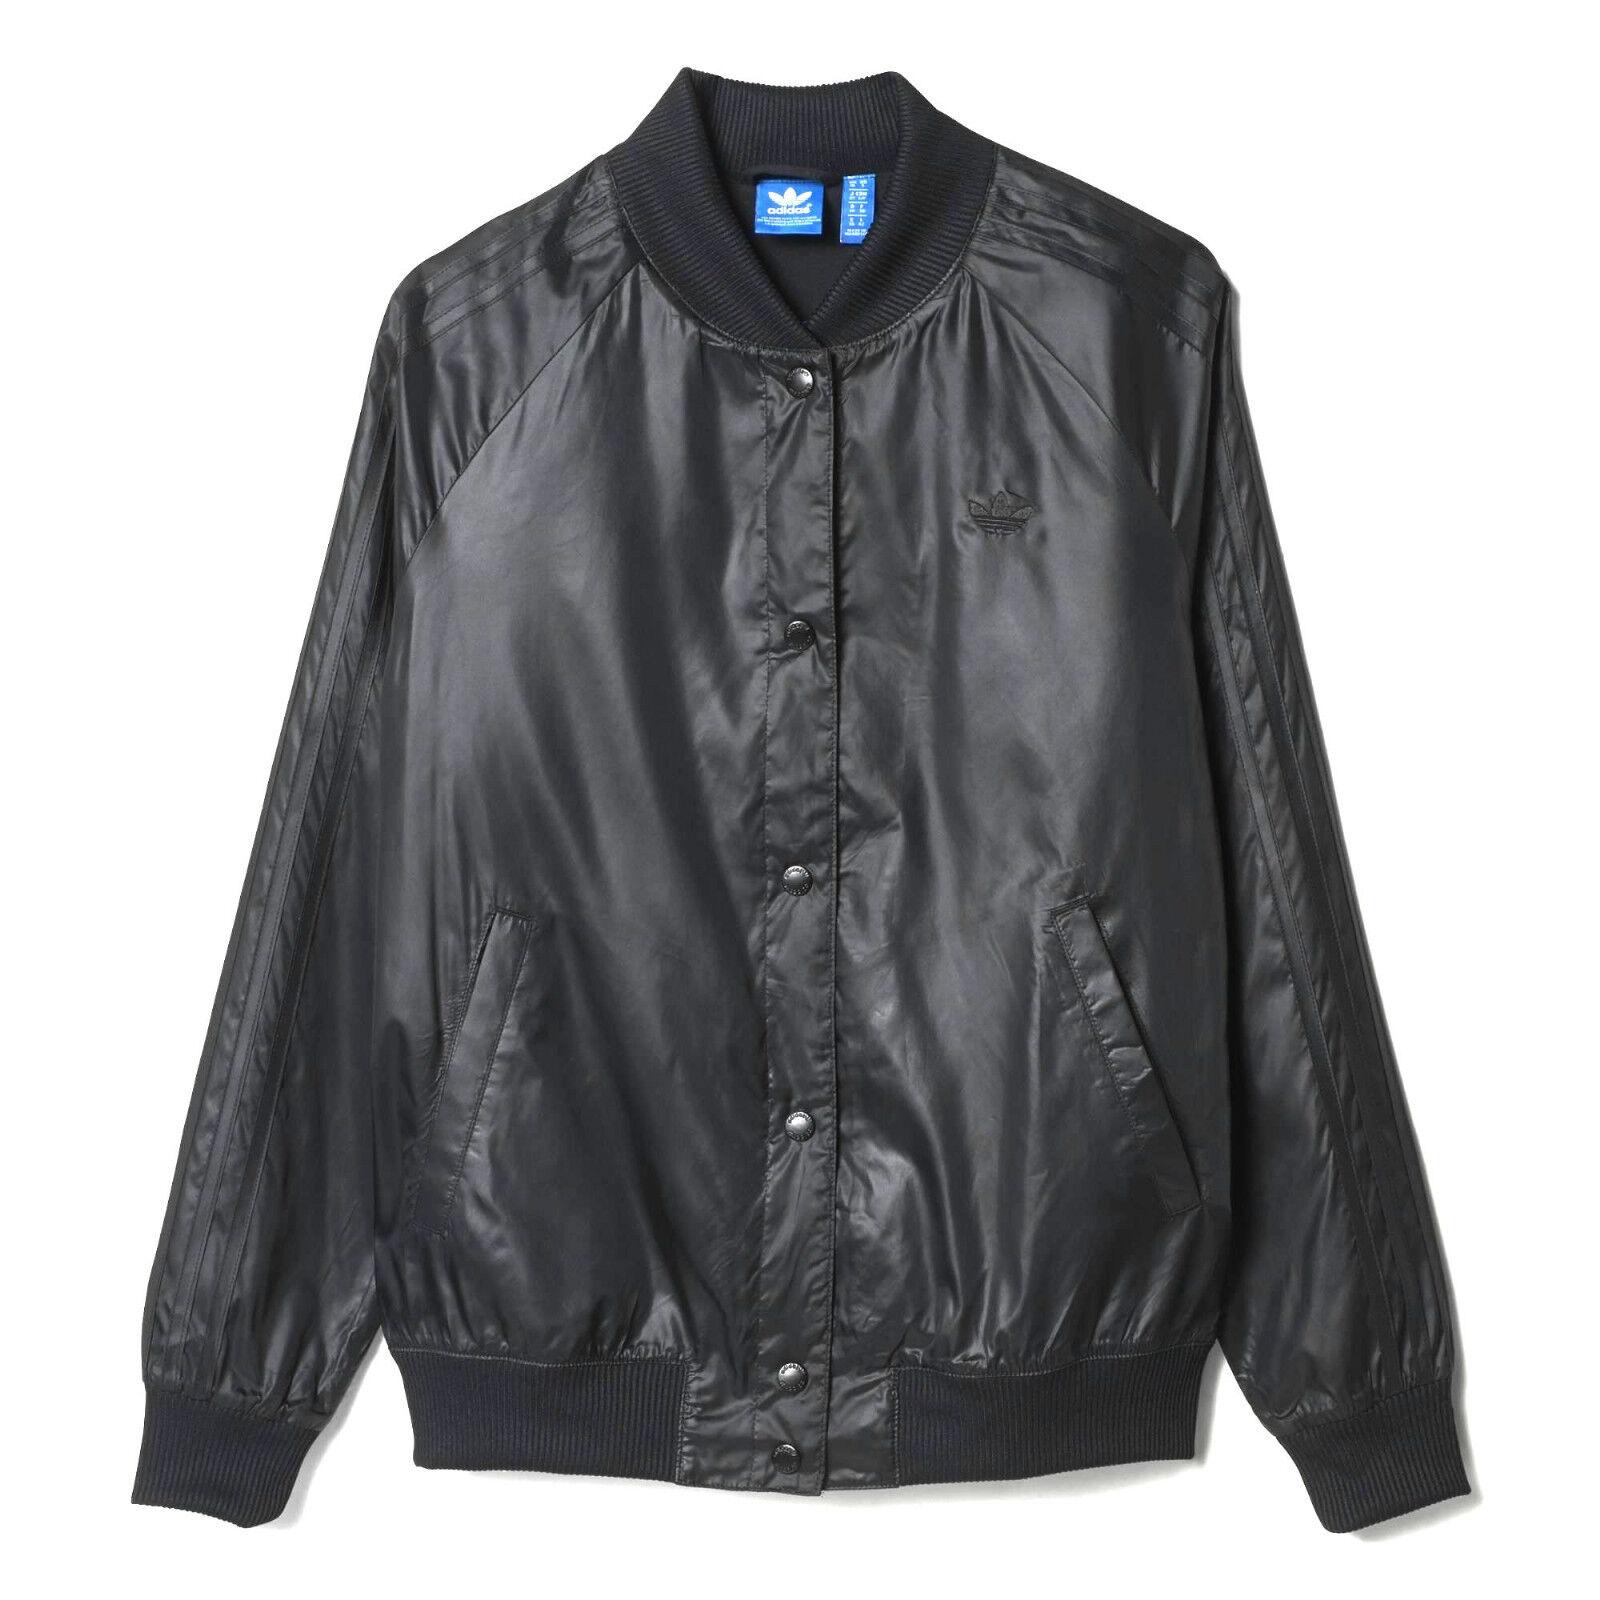 Adidas Womens College Jacket Μαλακό σατινέ νάυλον αποτέλΡσμα S19834 UK 14